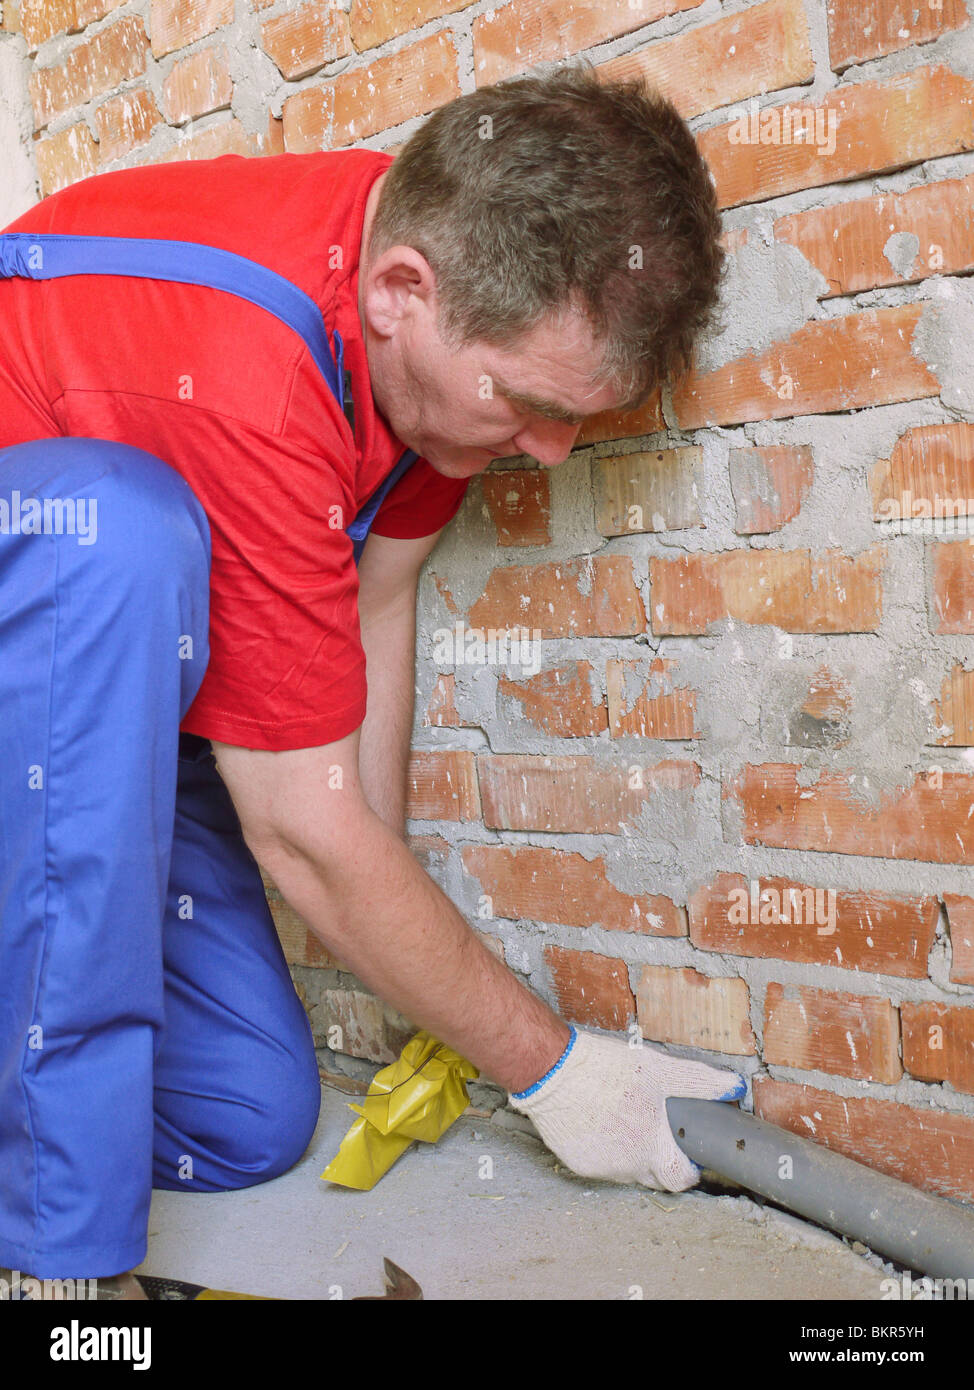 Plumber installing pvc sewage pipe inside unfinished house - Stock Image